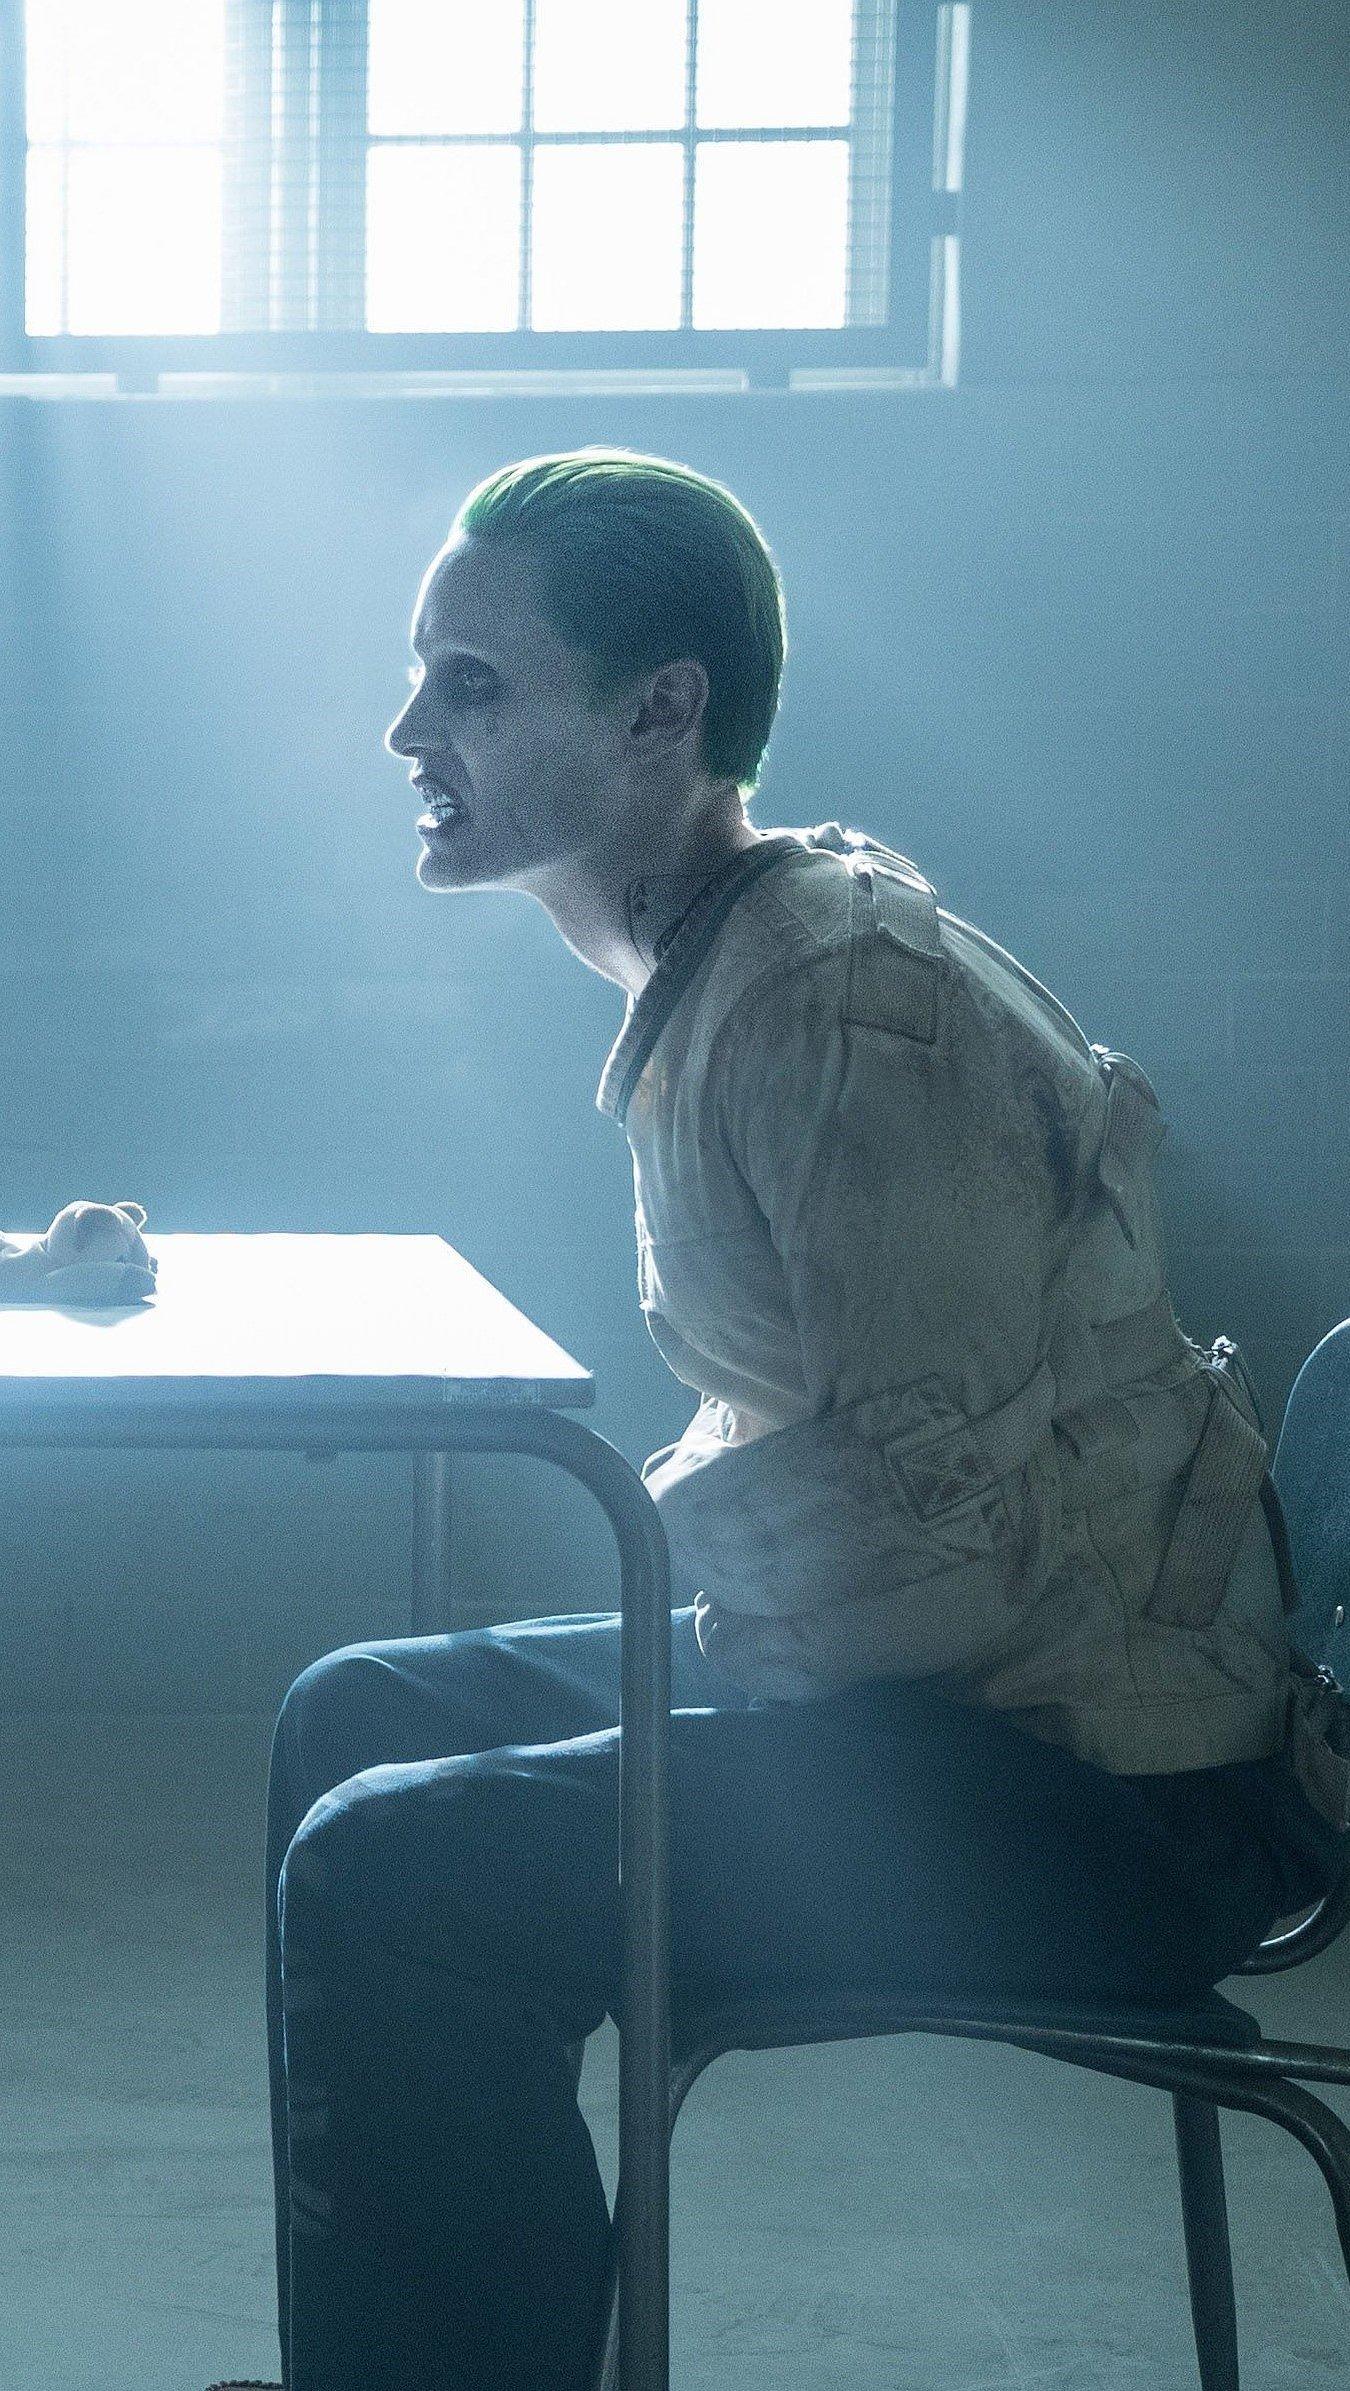 Fondos de pantalla Suicide Squad Jared Leto Joker y Margot Robbie Harley Quinn Vertical